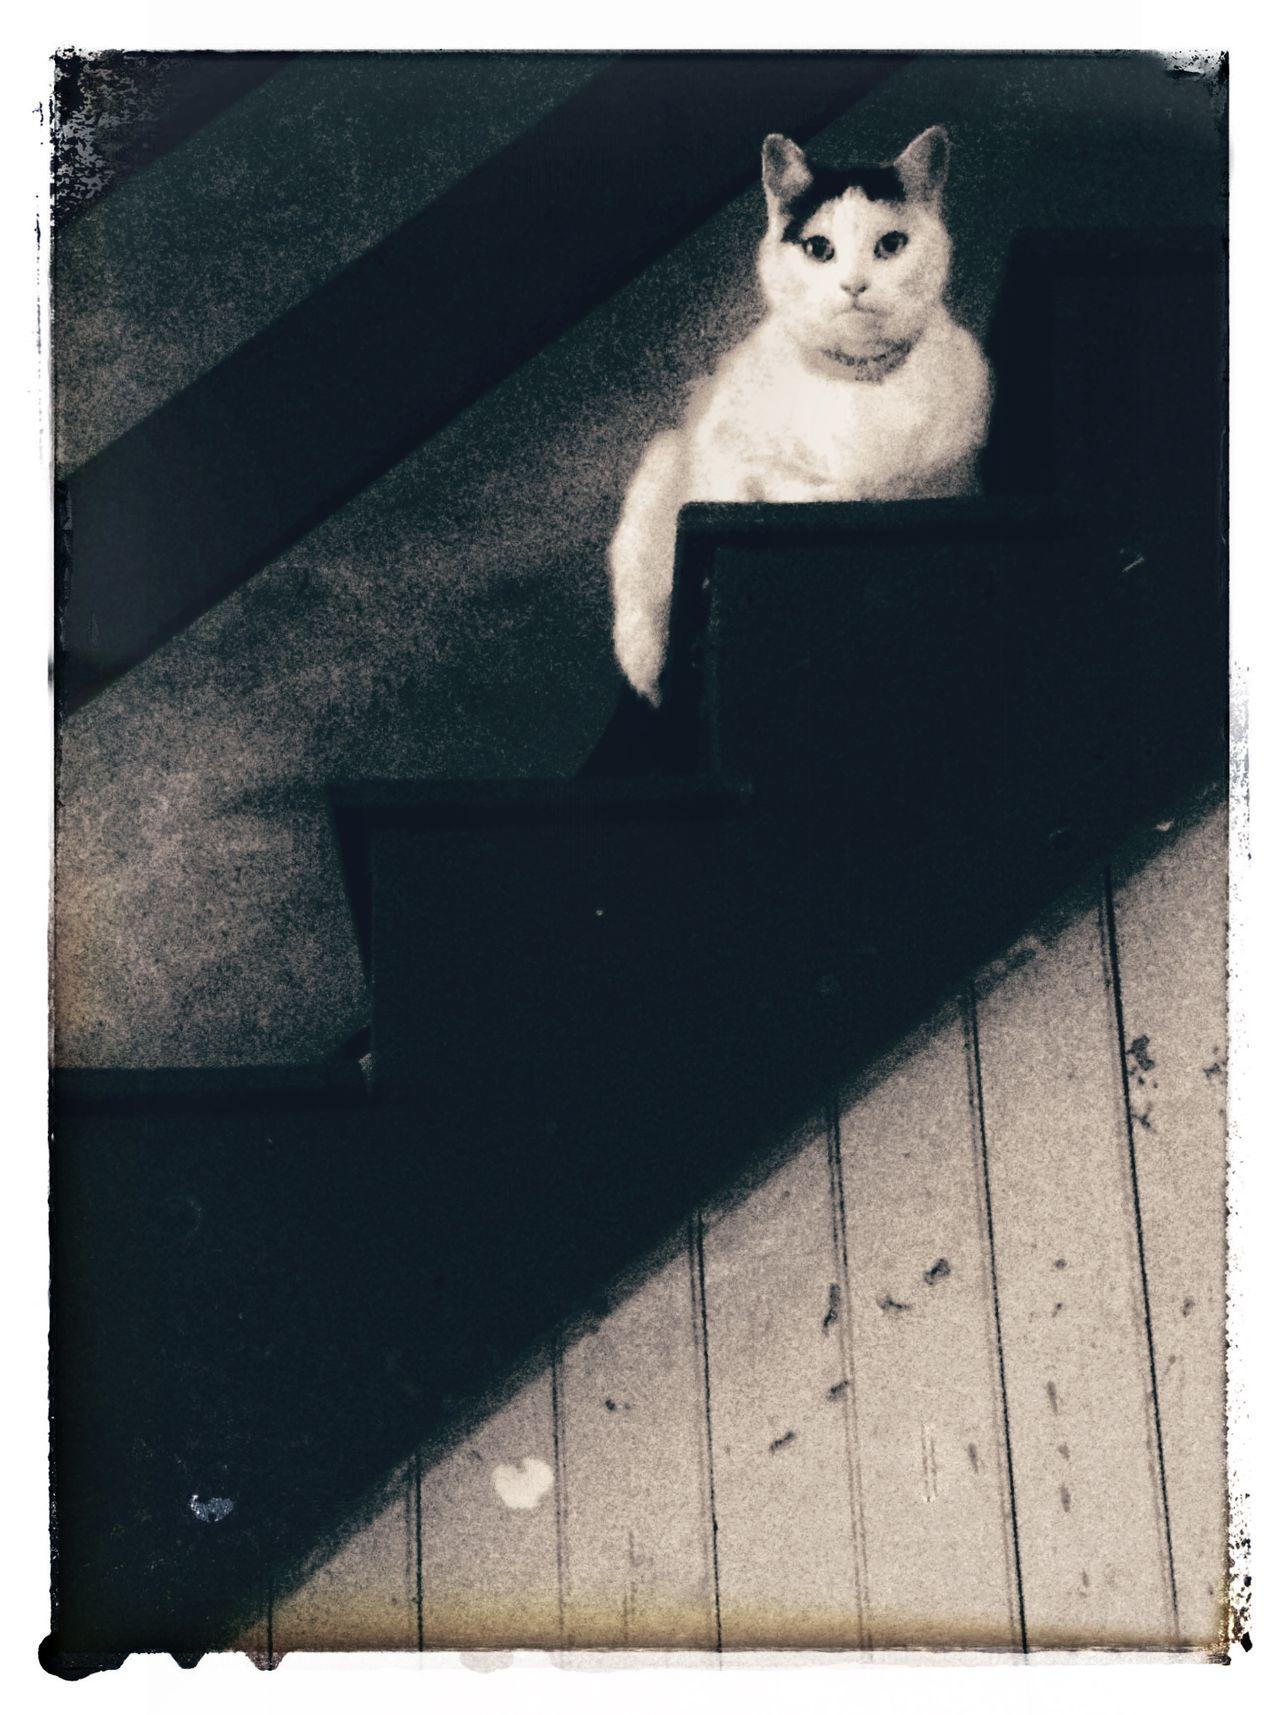 IPadography Snapseed Cat Katze Ilovemycat Pets Blackandwhite